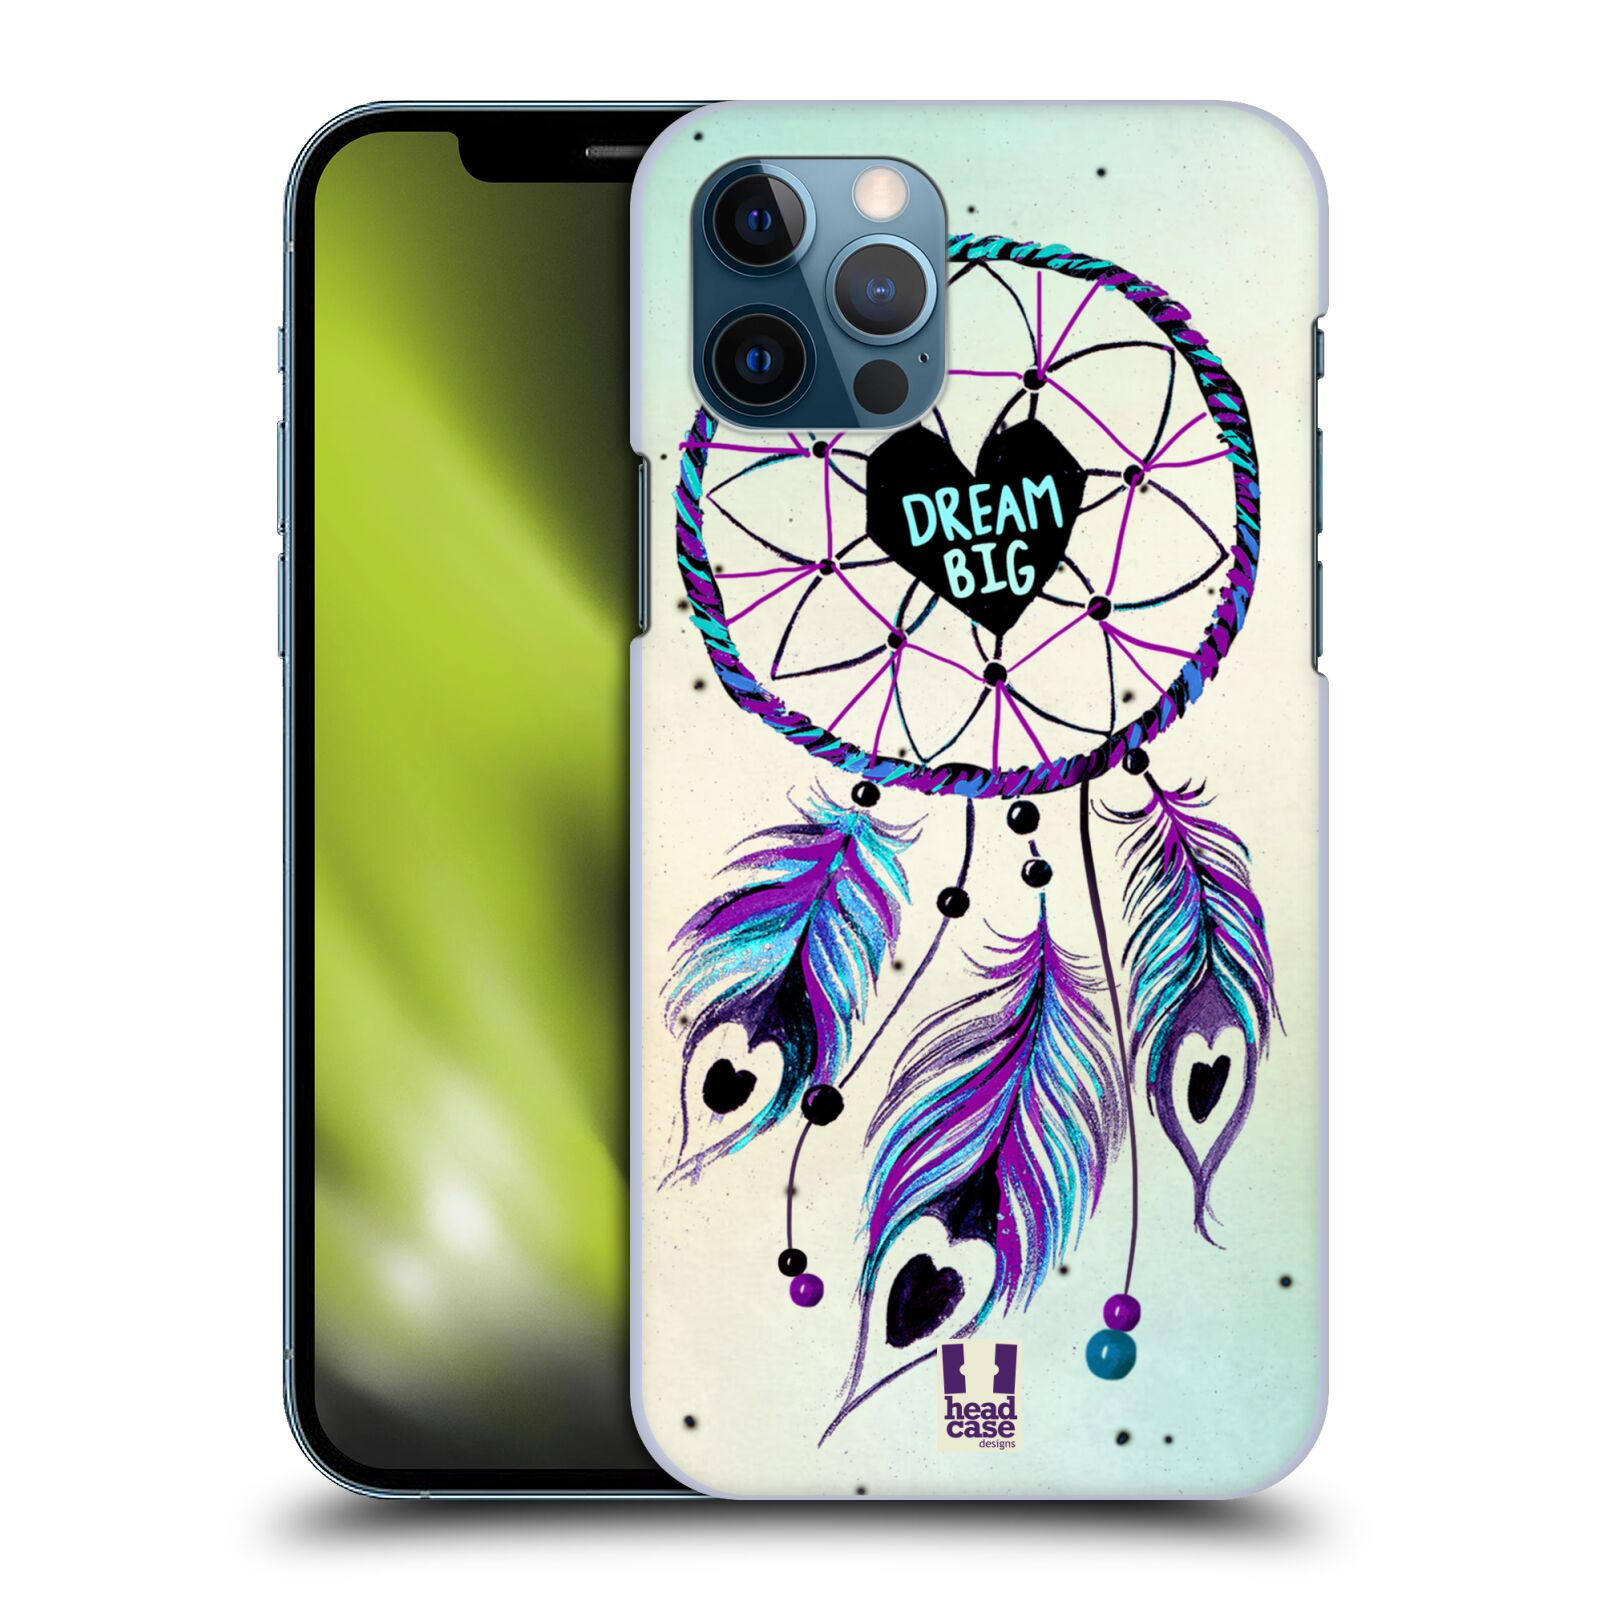 Plastové pouzdro na mobil Apple iPhone 12 / 12 Pro - Head Case - Lapač Assorted Dream Big Srdce